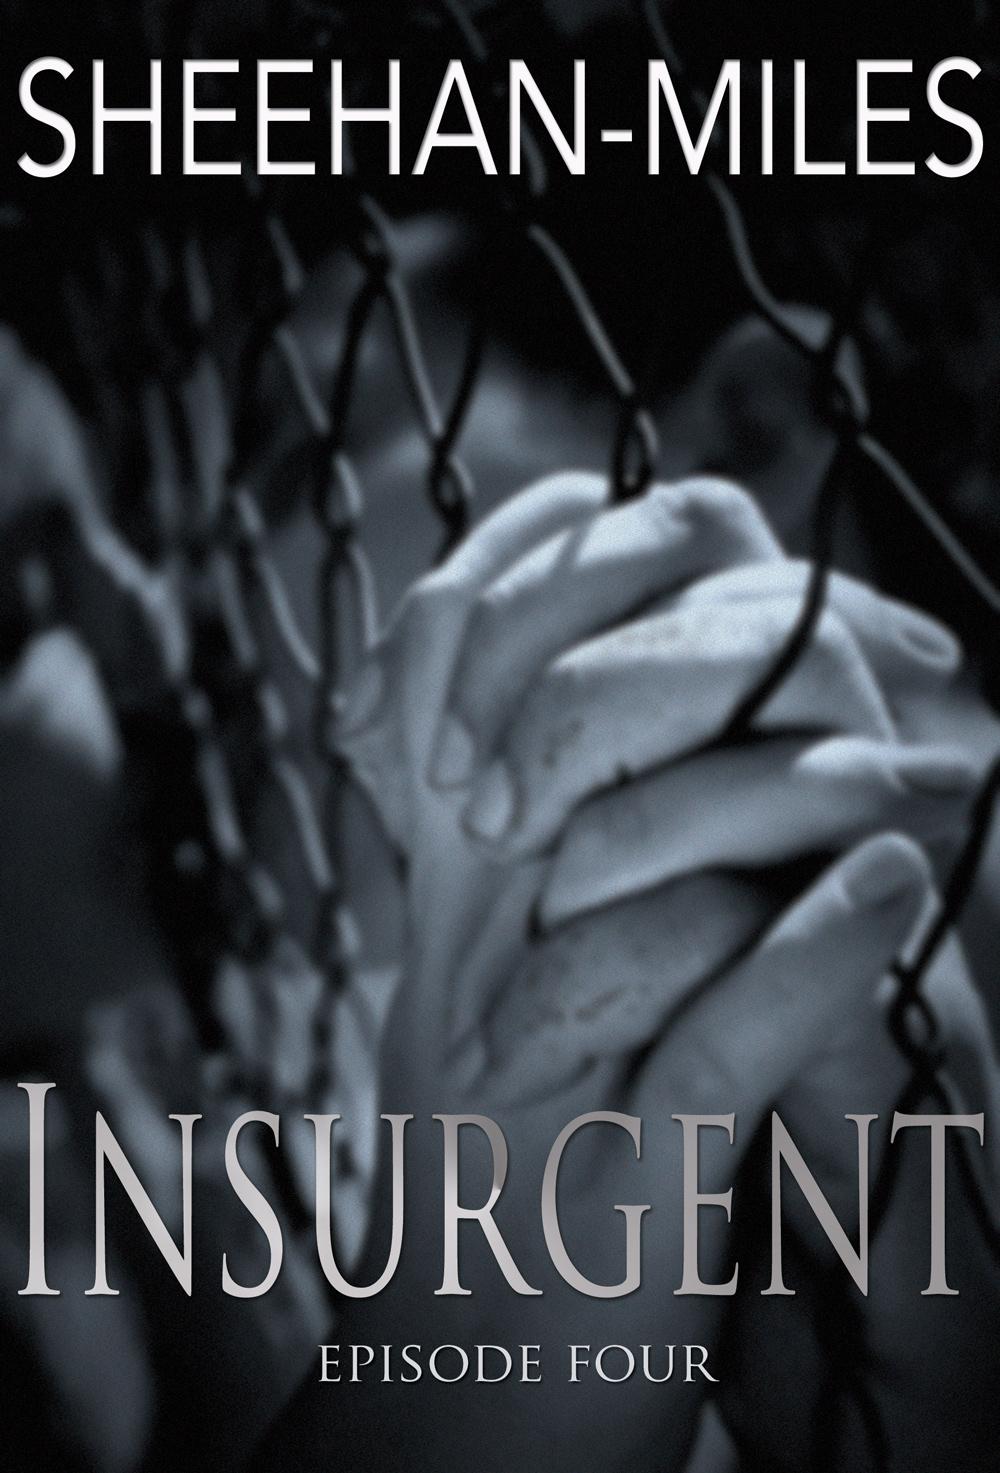 Insurgent (Episode 4) released